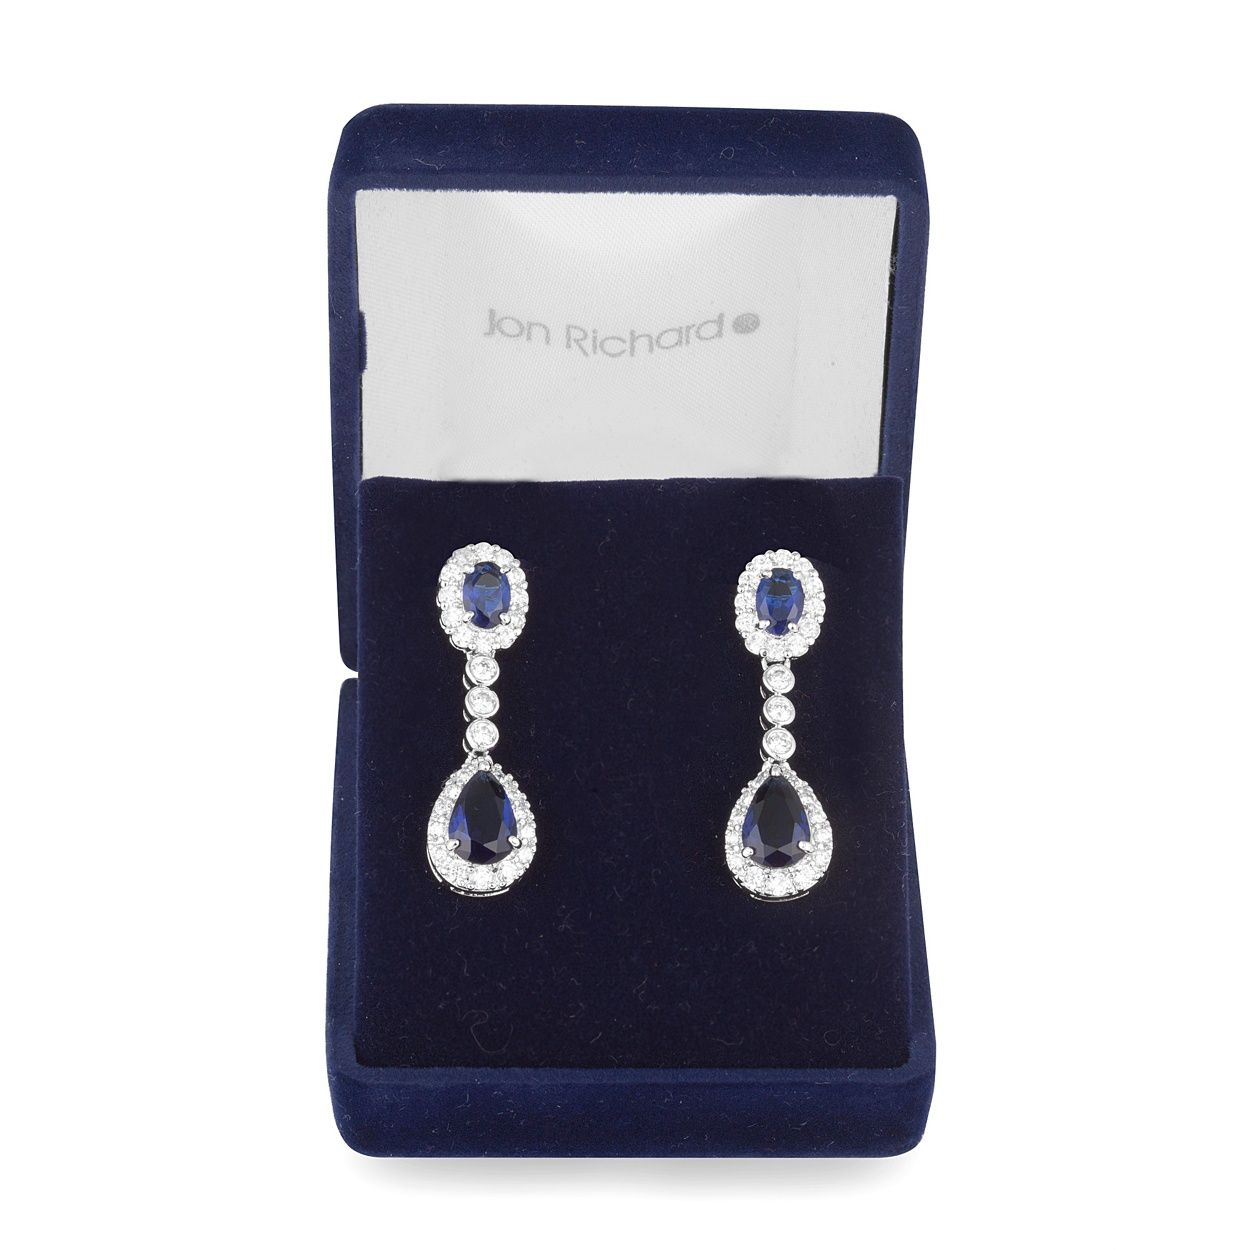 Jon Richard Cubic Zirconia Crystal Blue Drop Earring At Debenhams